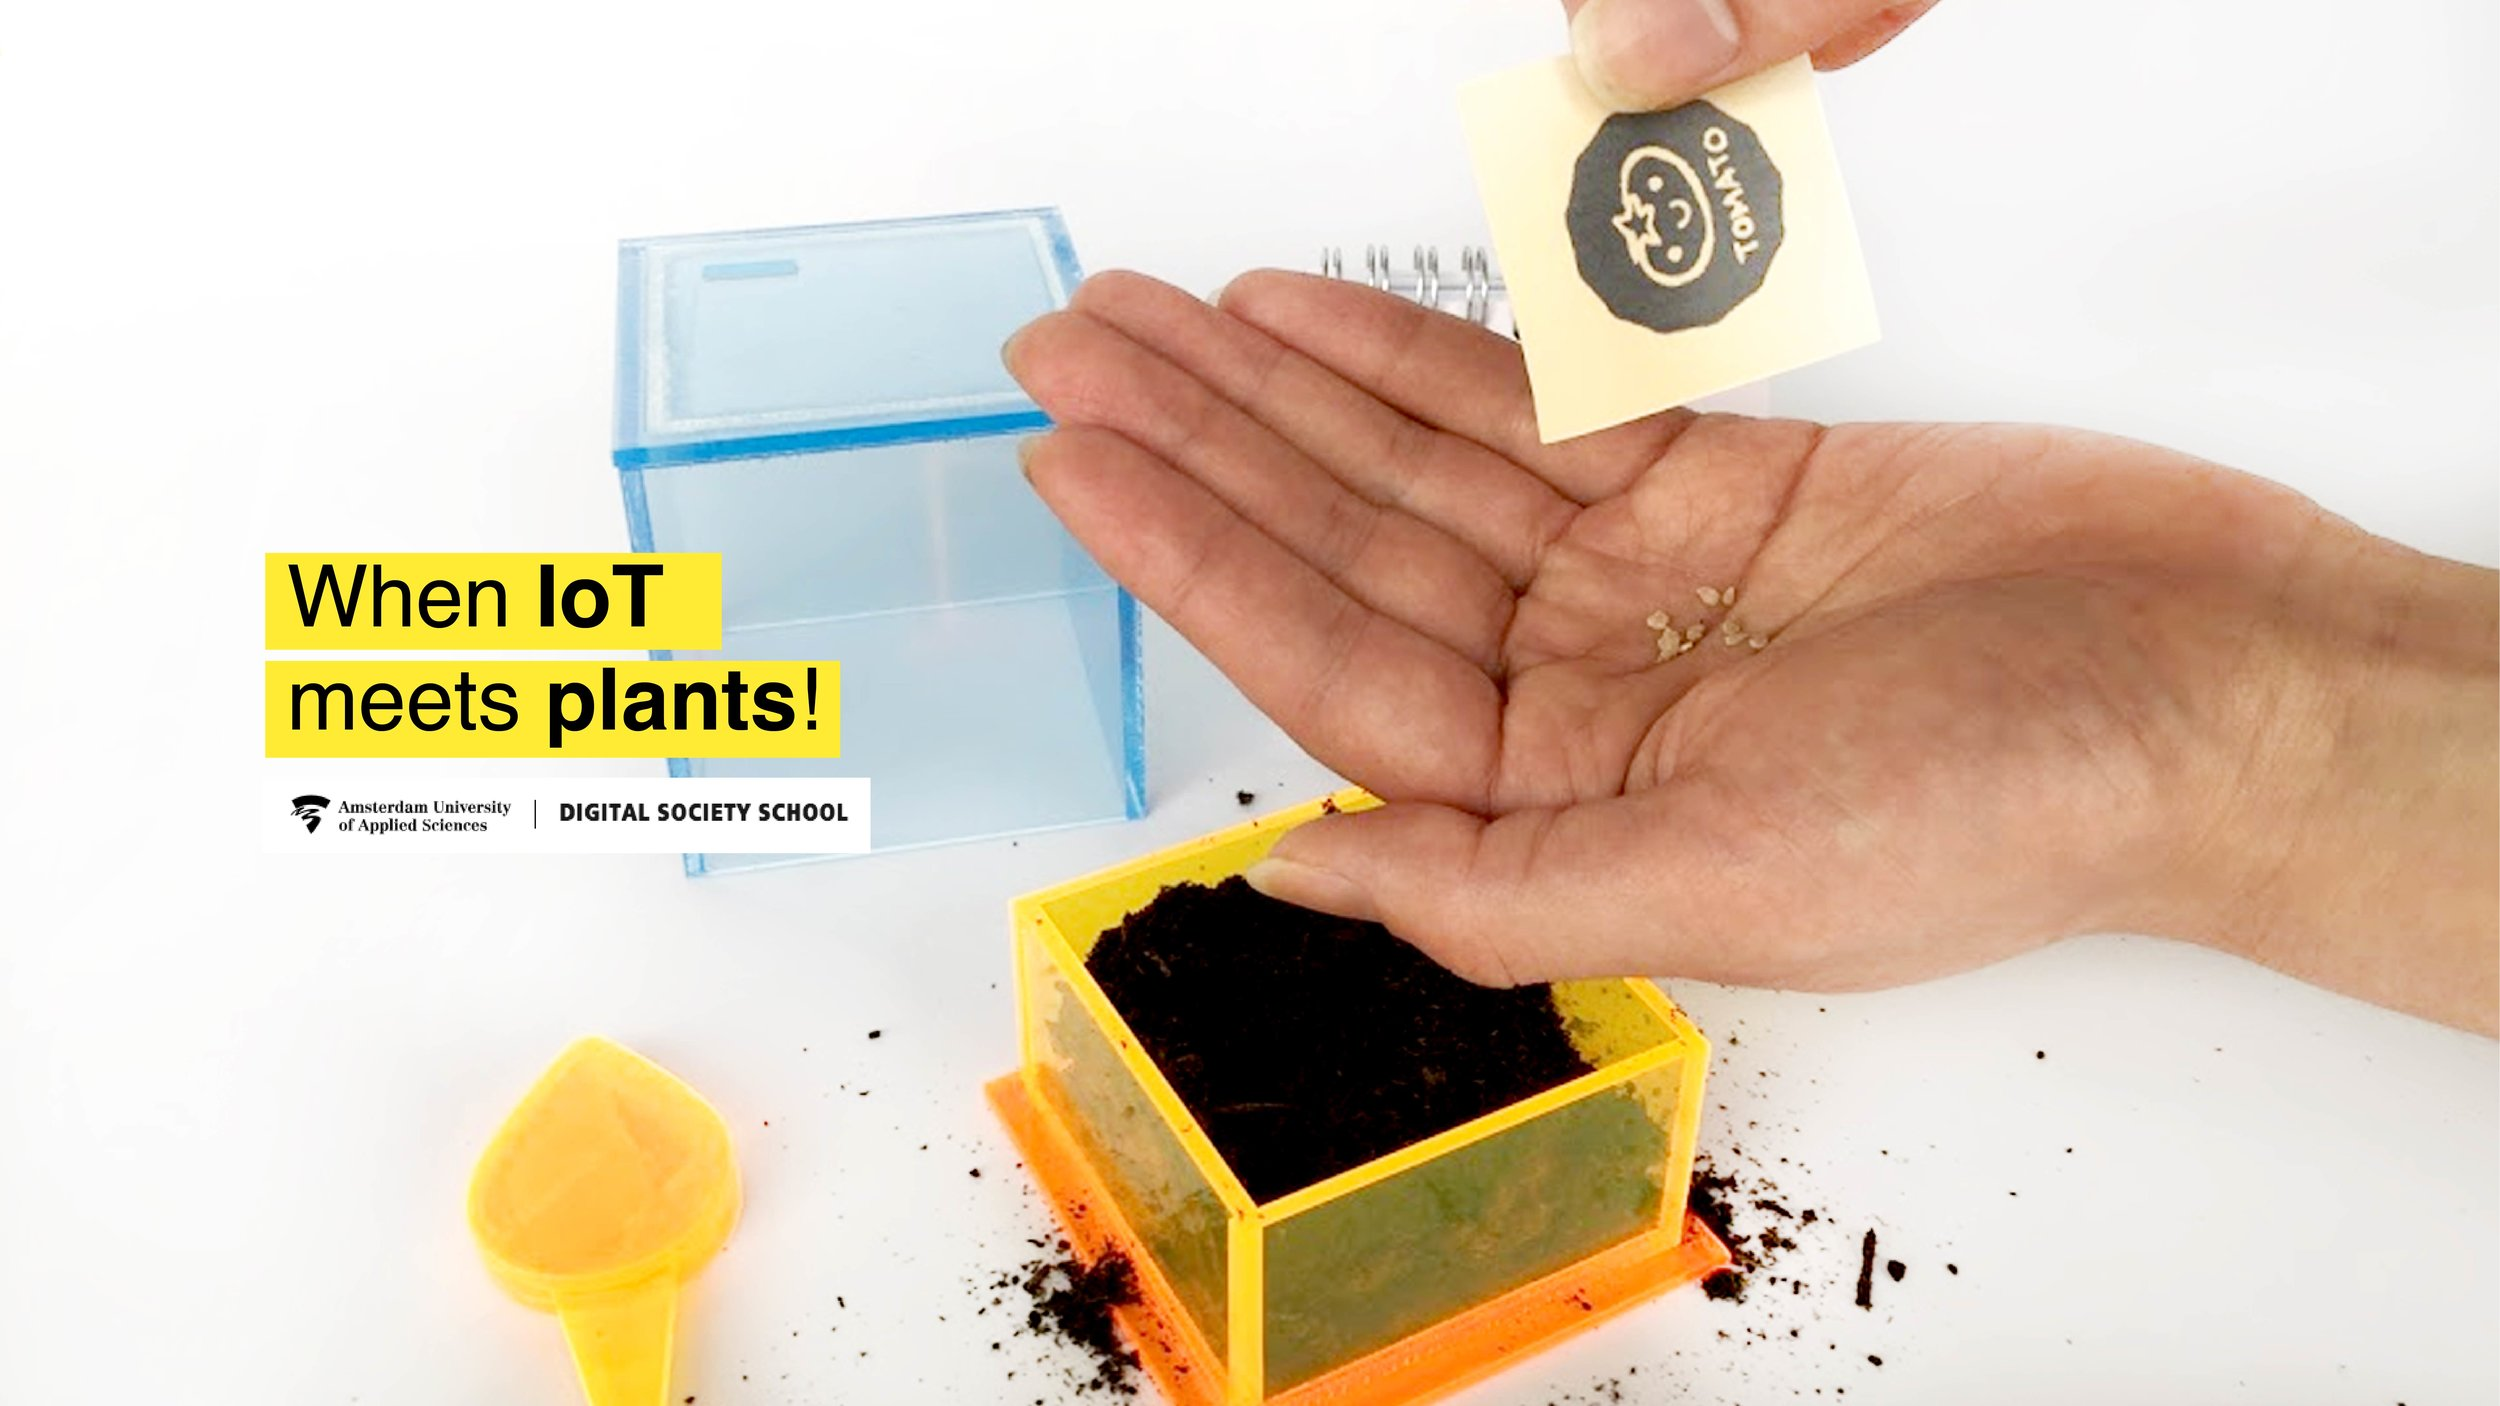 Iot_plants.jpg